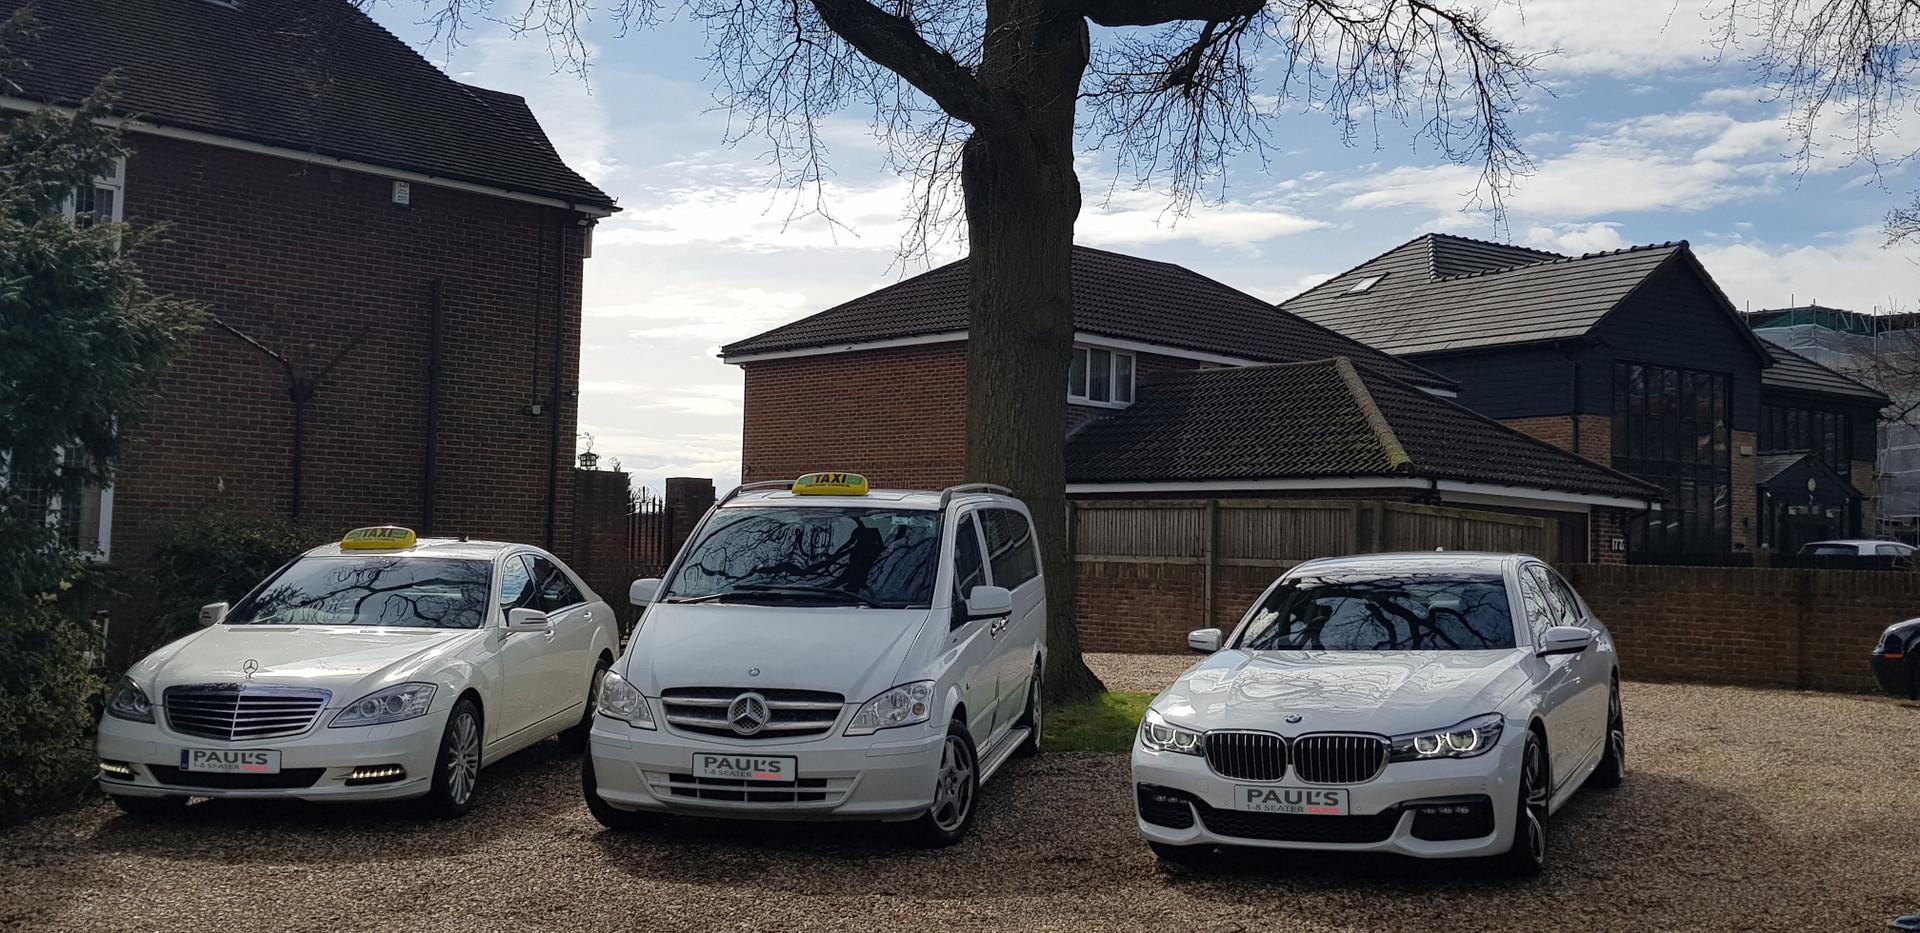 Paul's taxi fleet